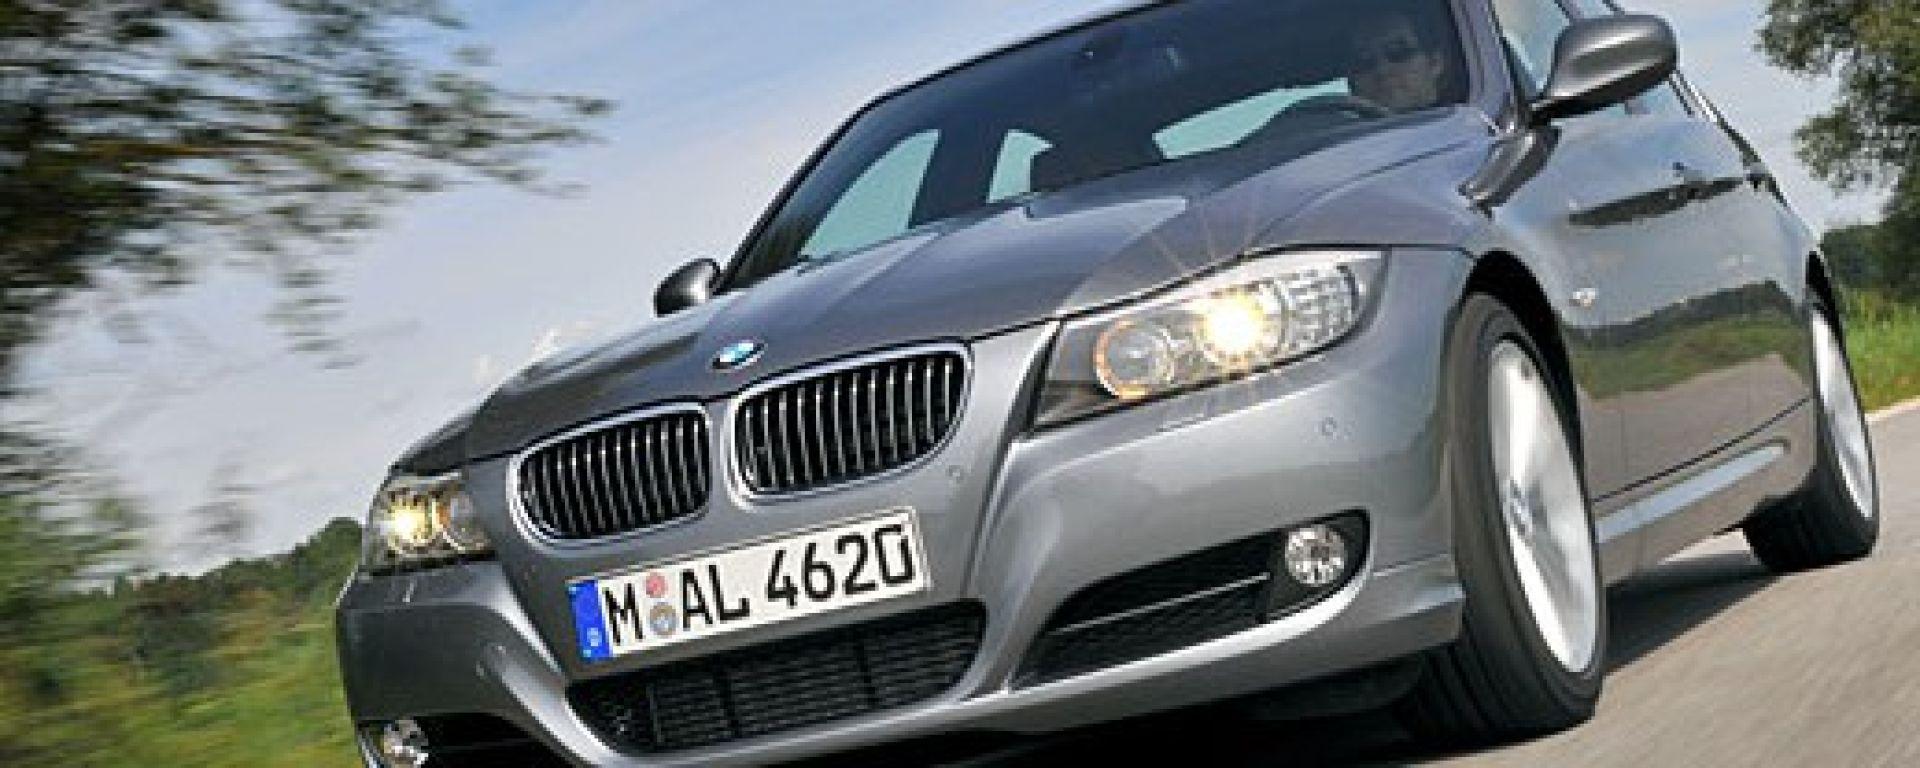 05-08 Limousine Touring Motorhaube BMW 3er E90 E91 Bj